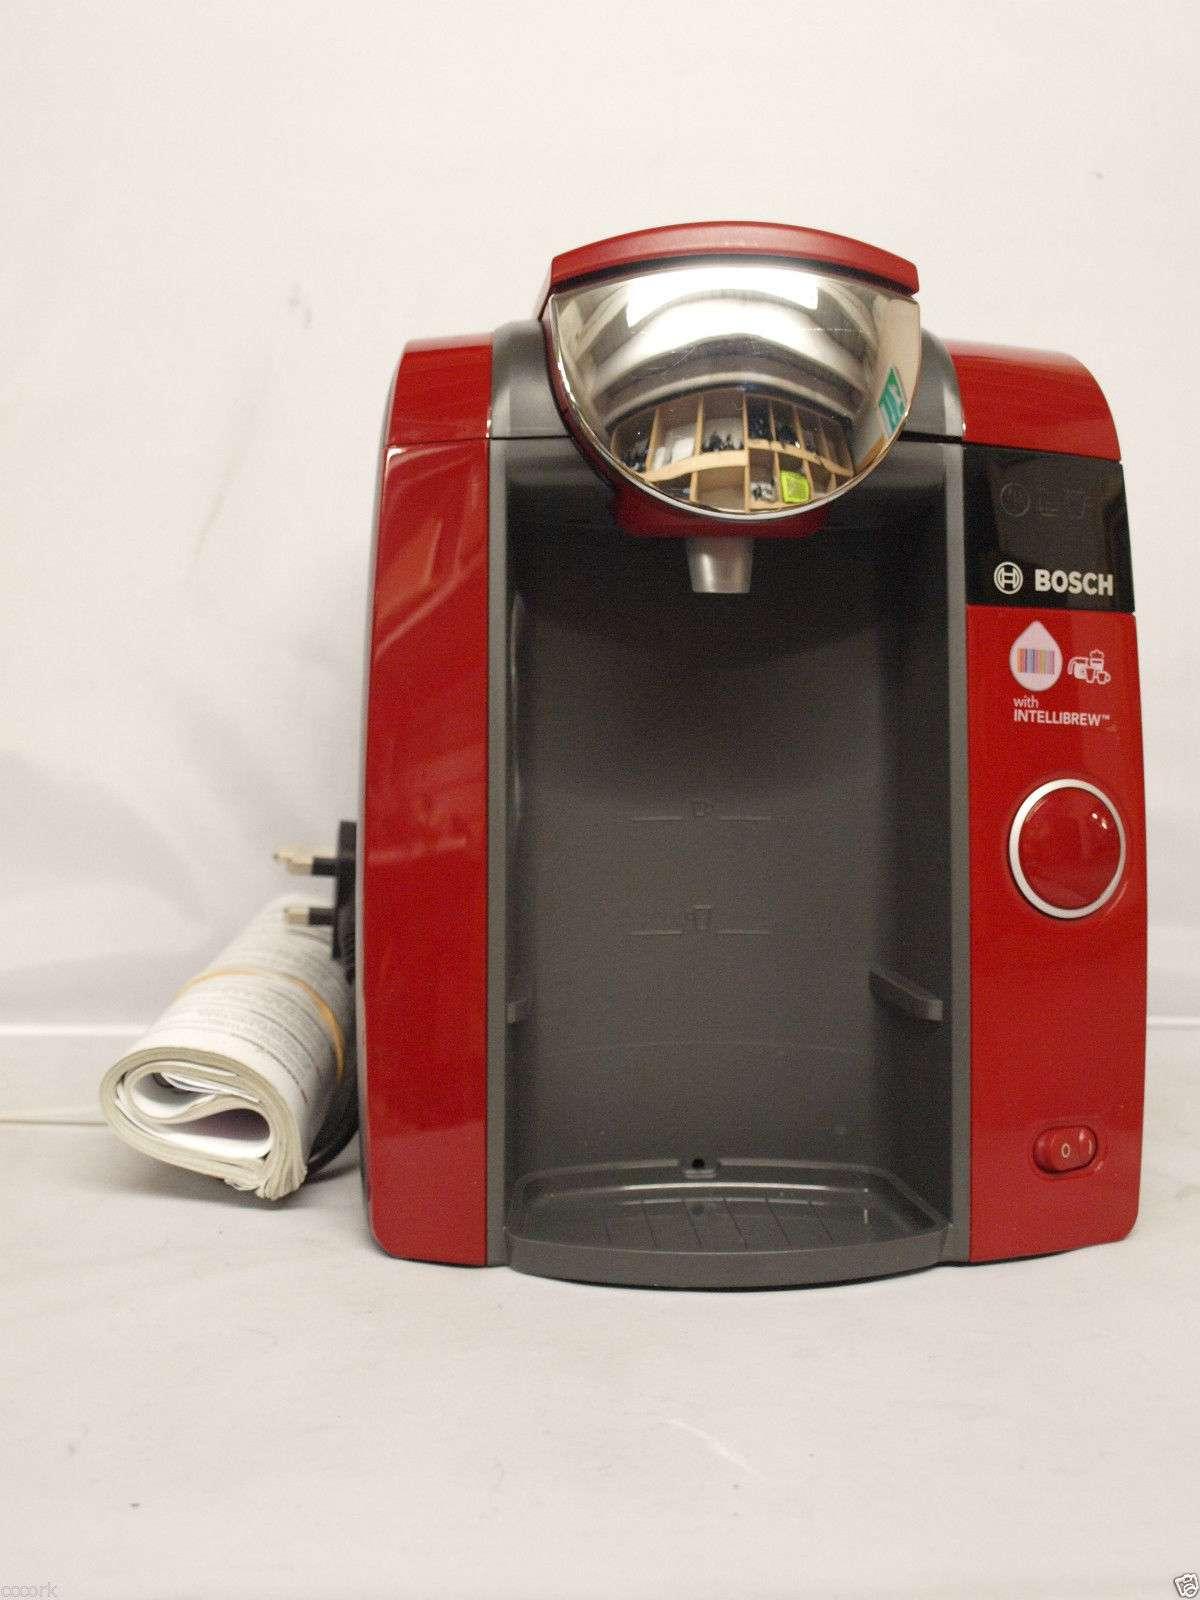 Bosch CTPM06 Tassimo Coffee Maker RED